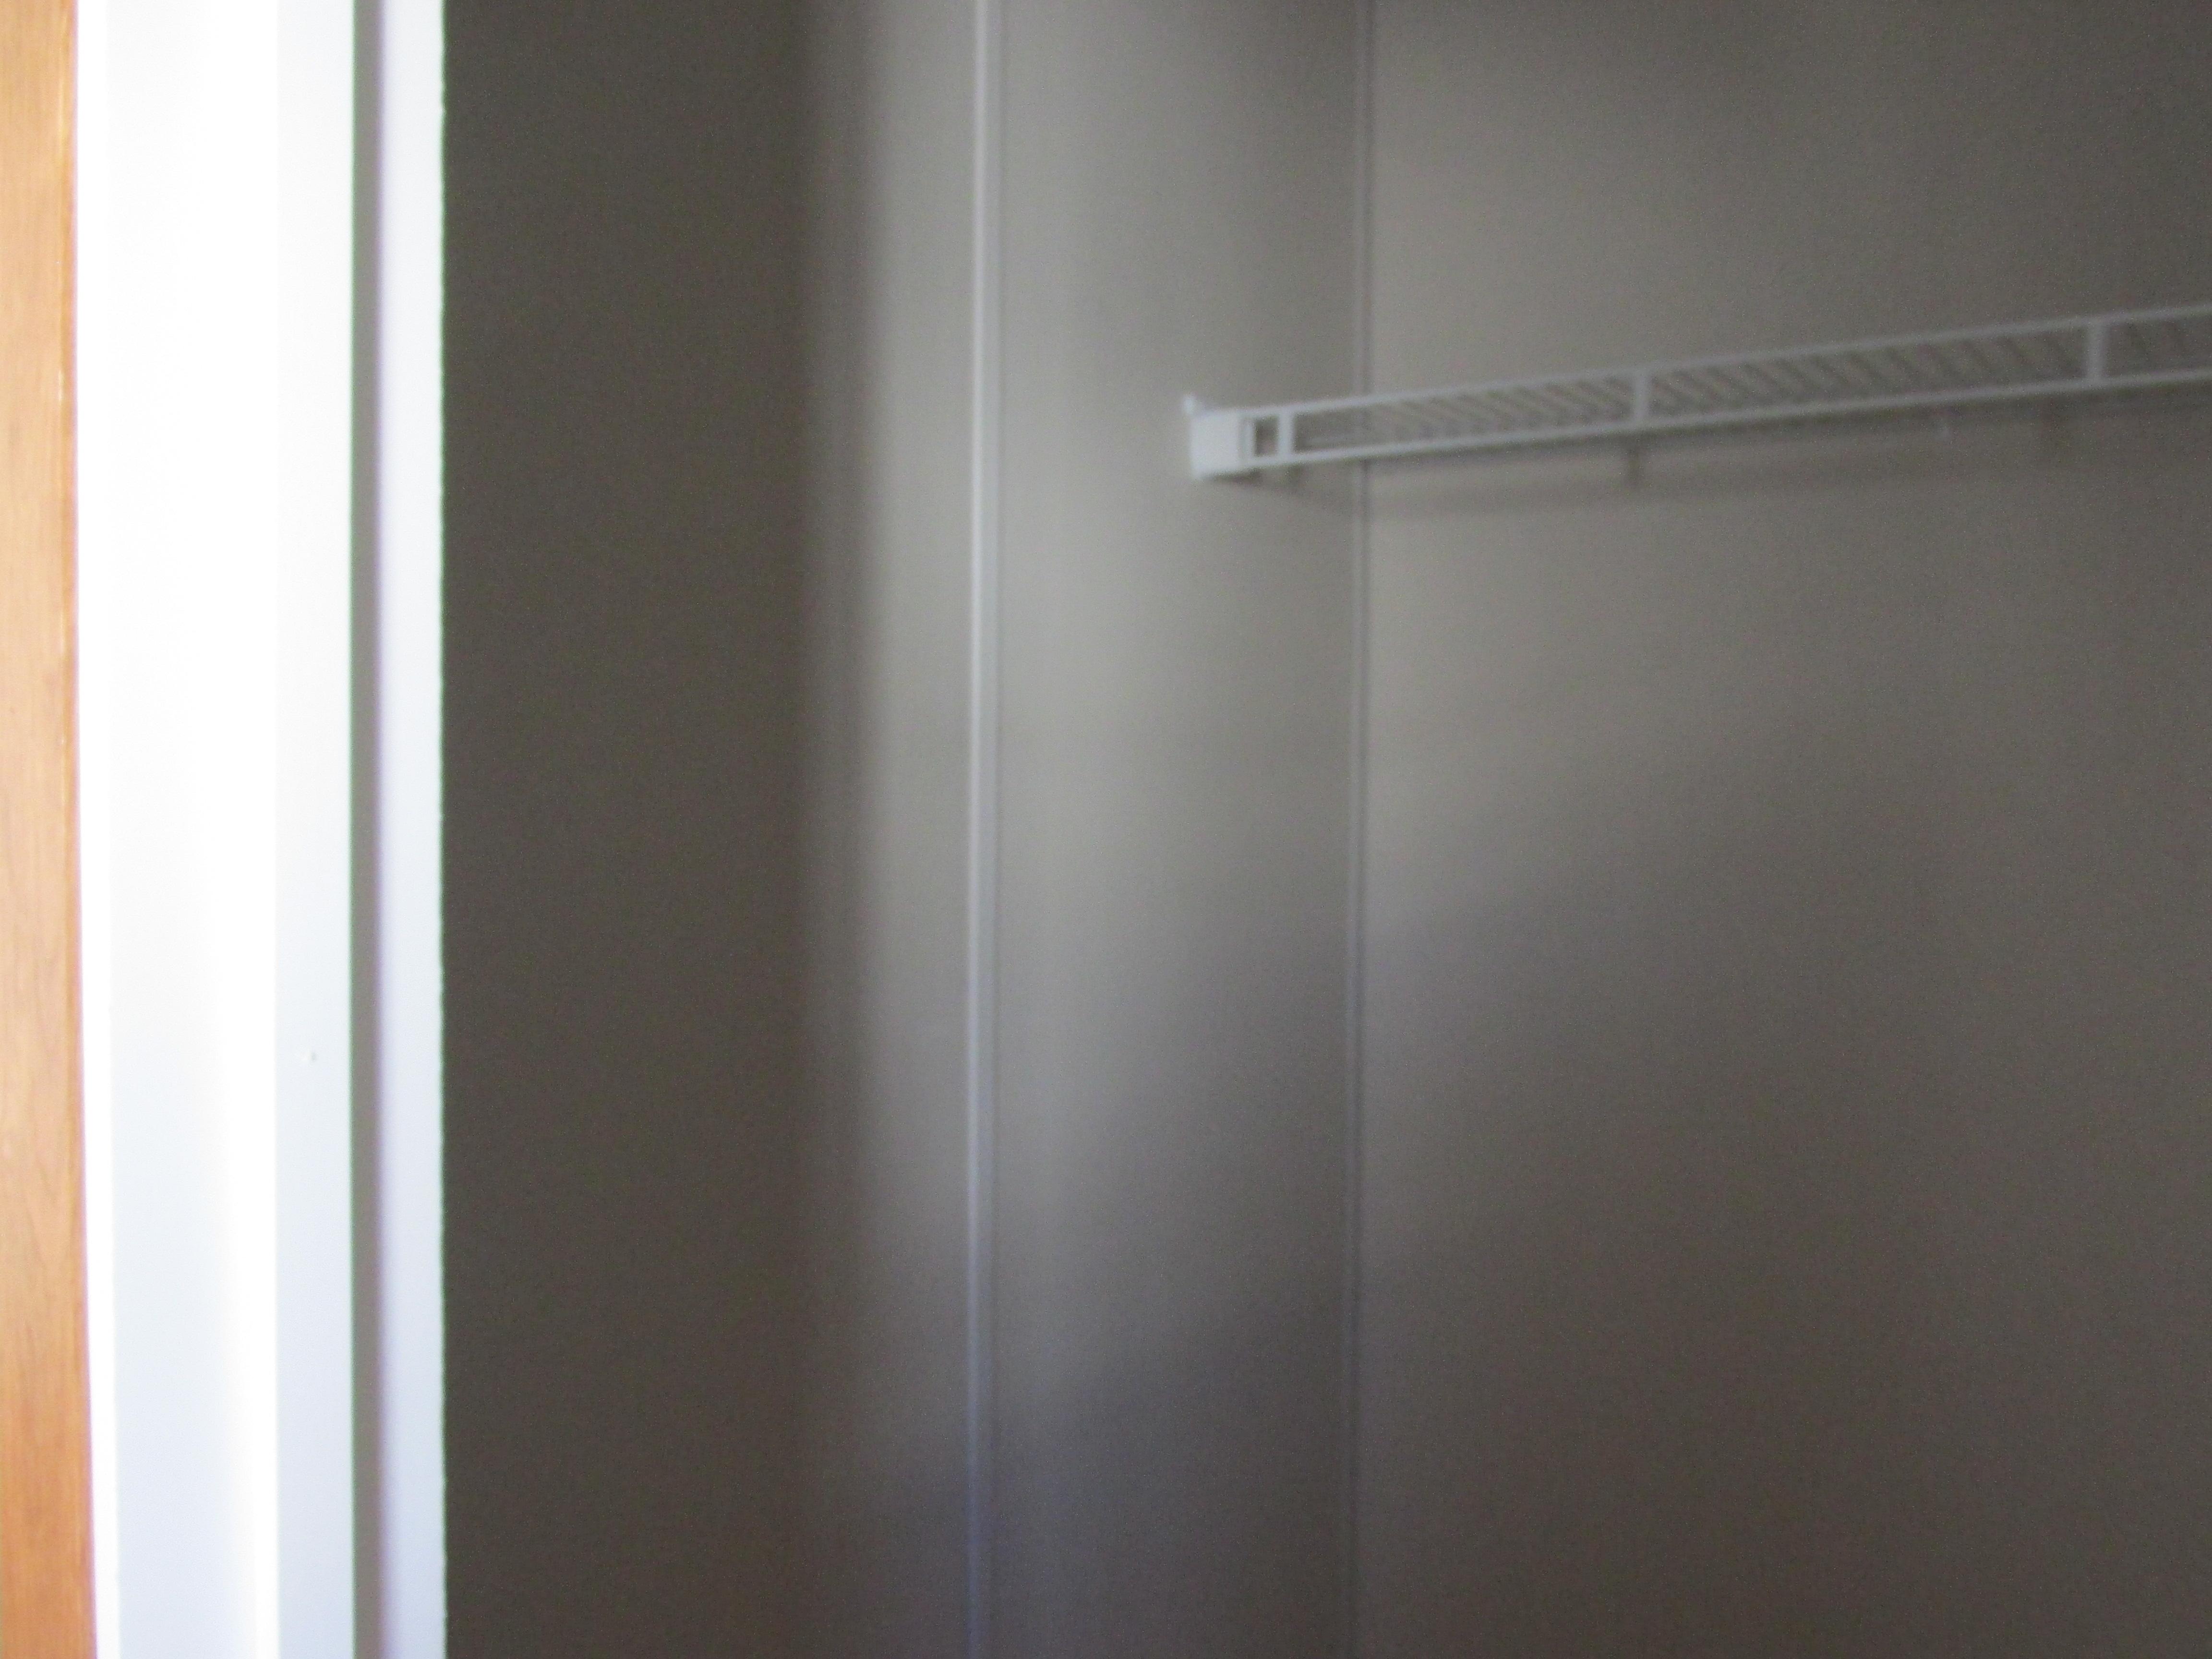 400 Bedroom#1 Closet3.JPG